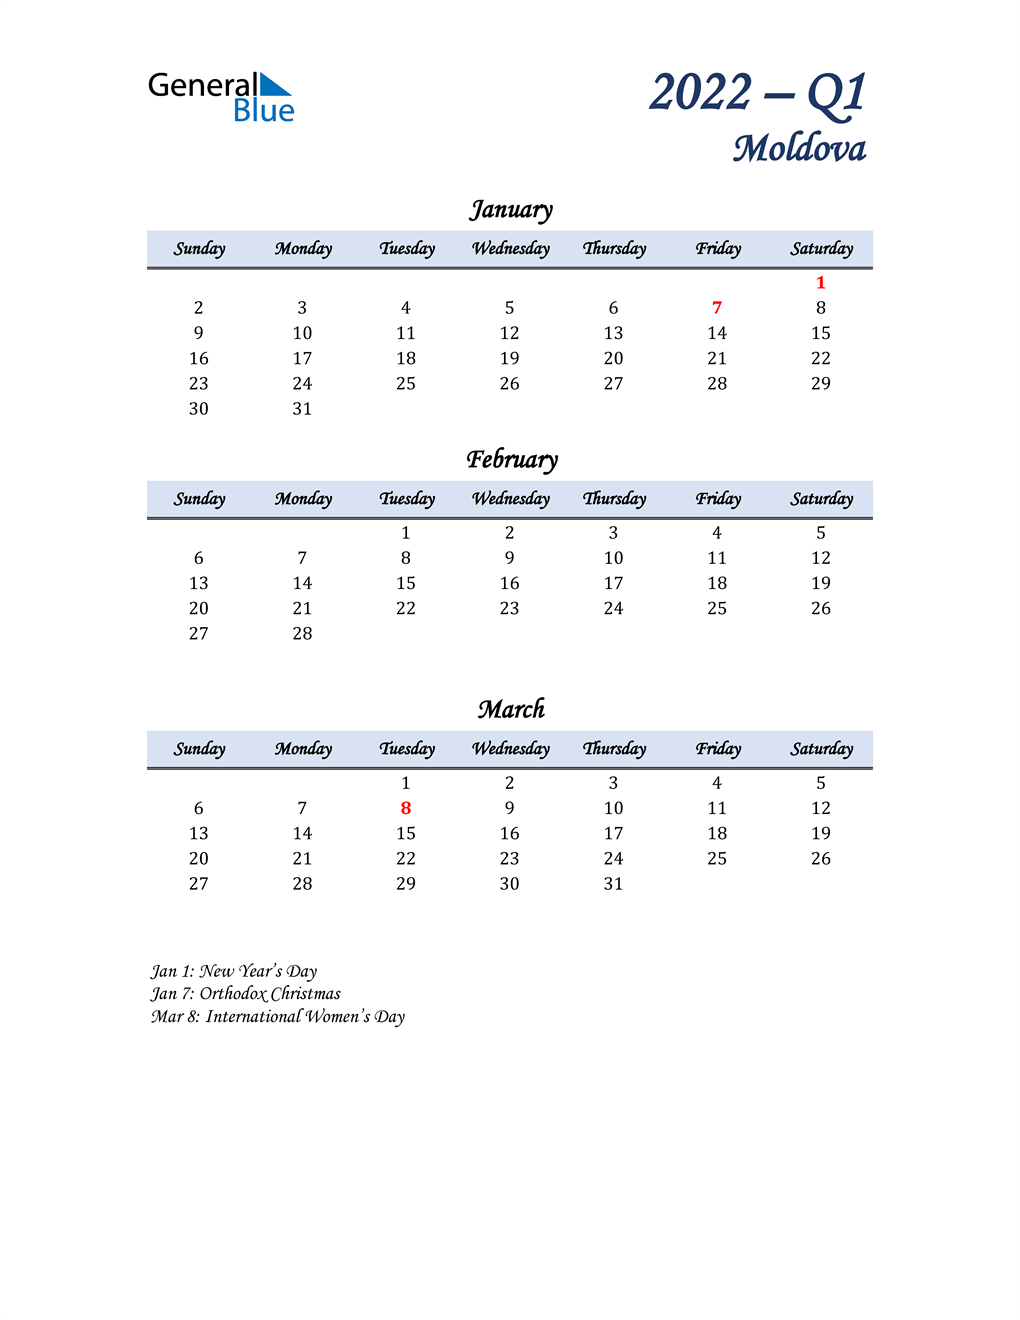 January, February, and March Calendar for Moldova